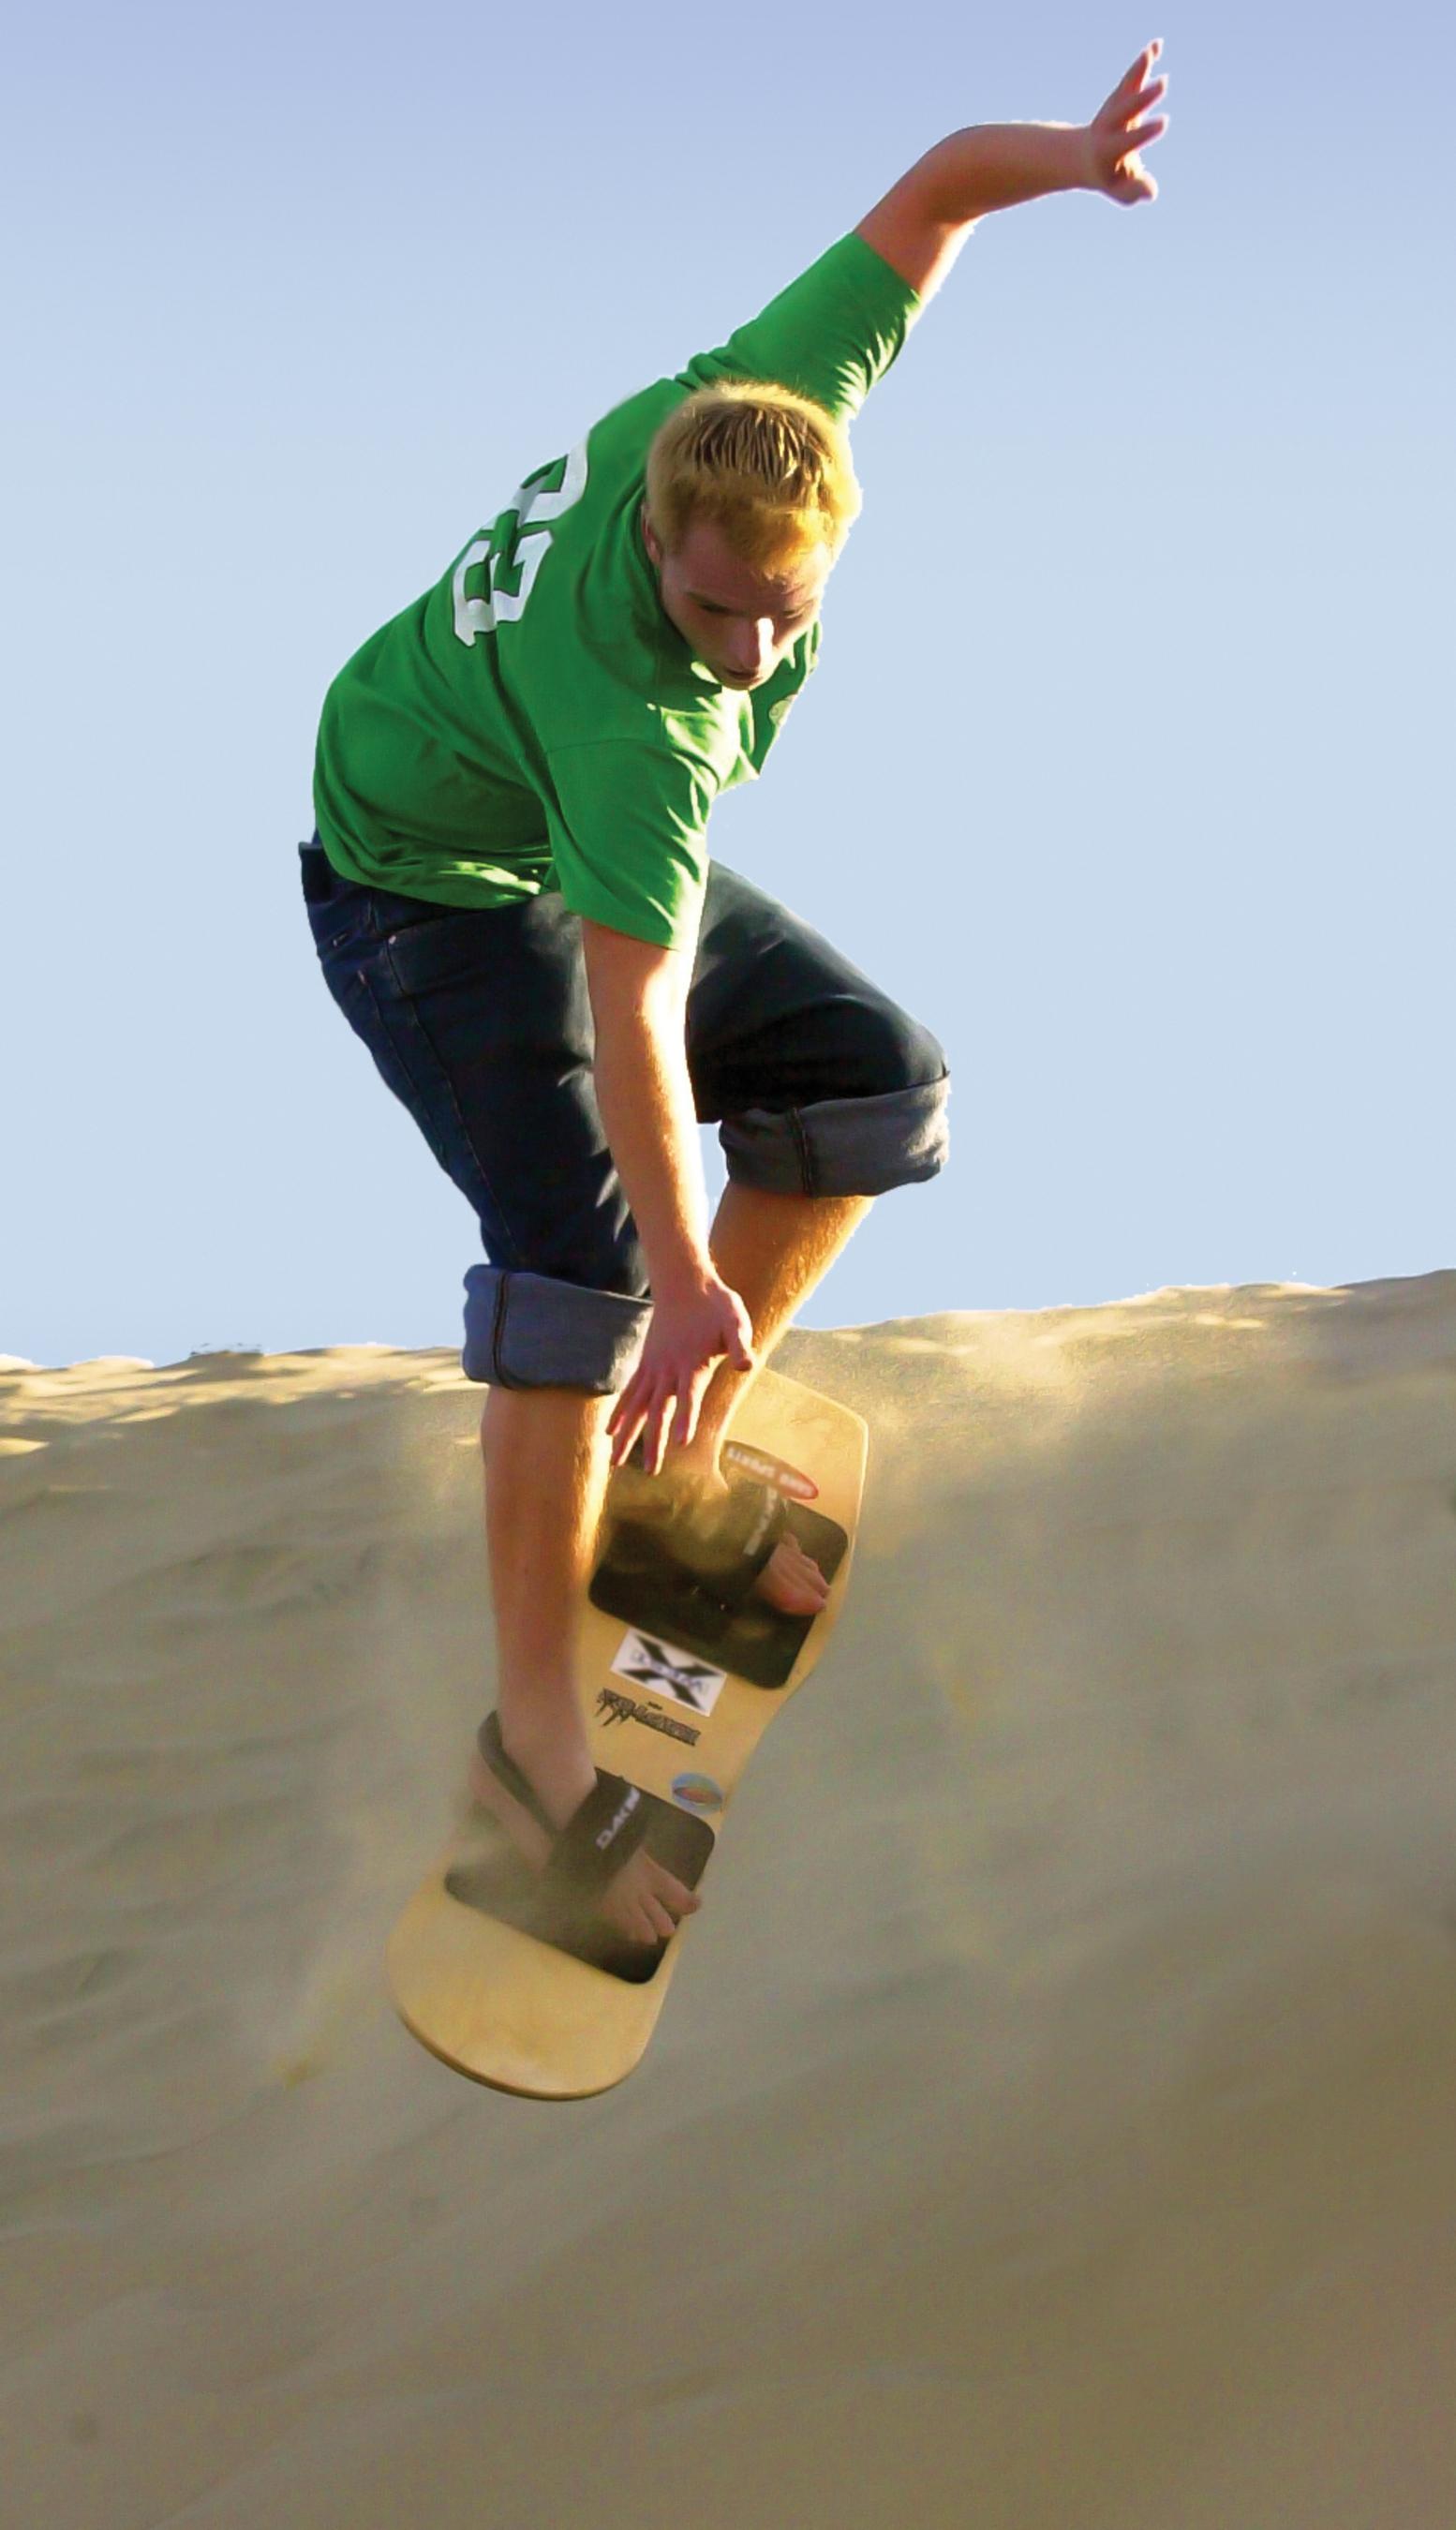 Sandboarding the Oregon Dunes in Florence! (PRNewsFoto/Florence Chamber)